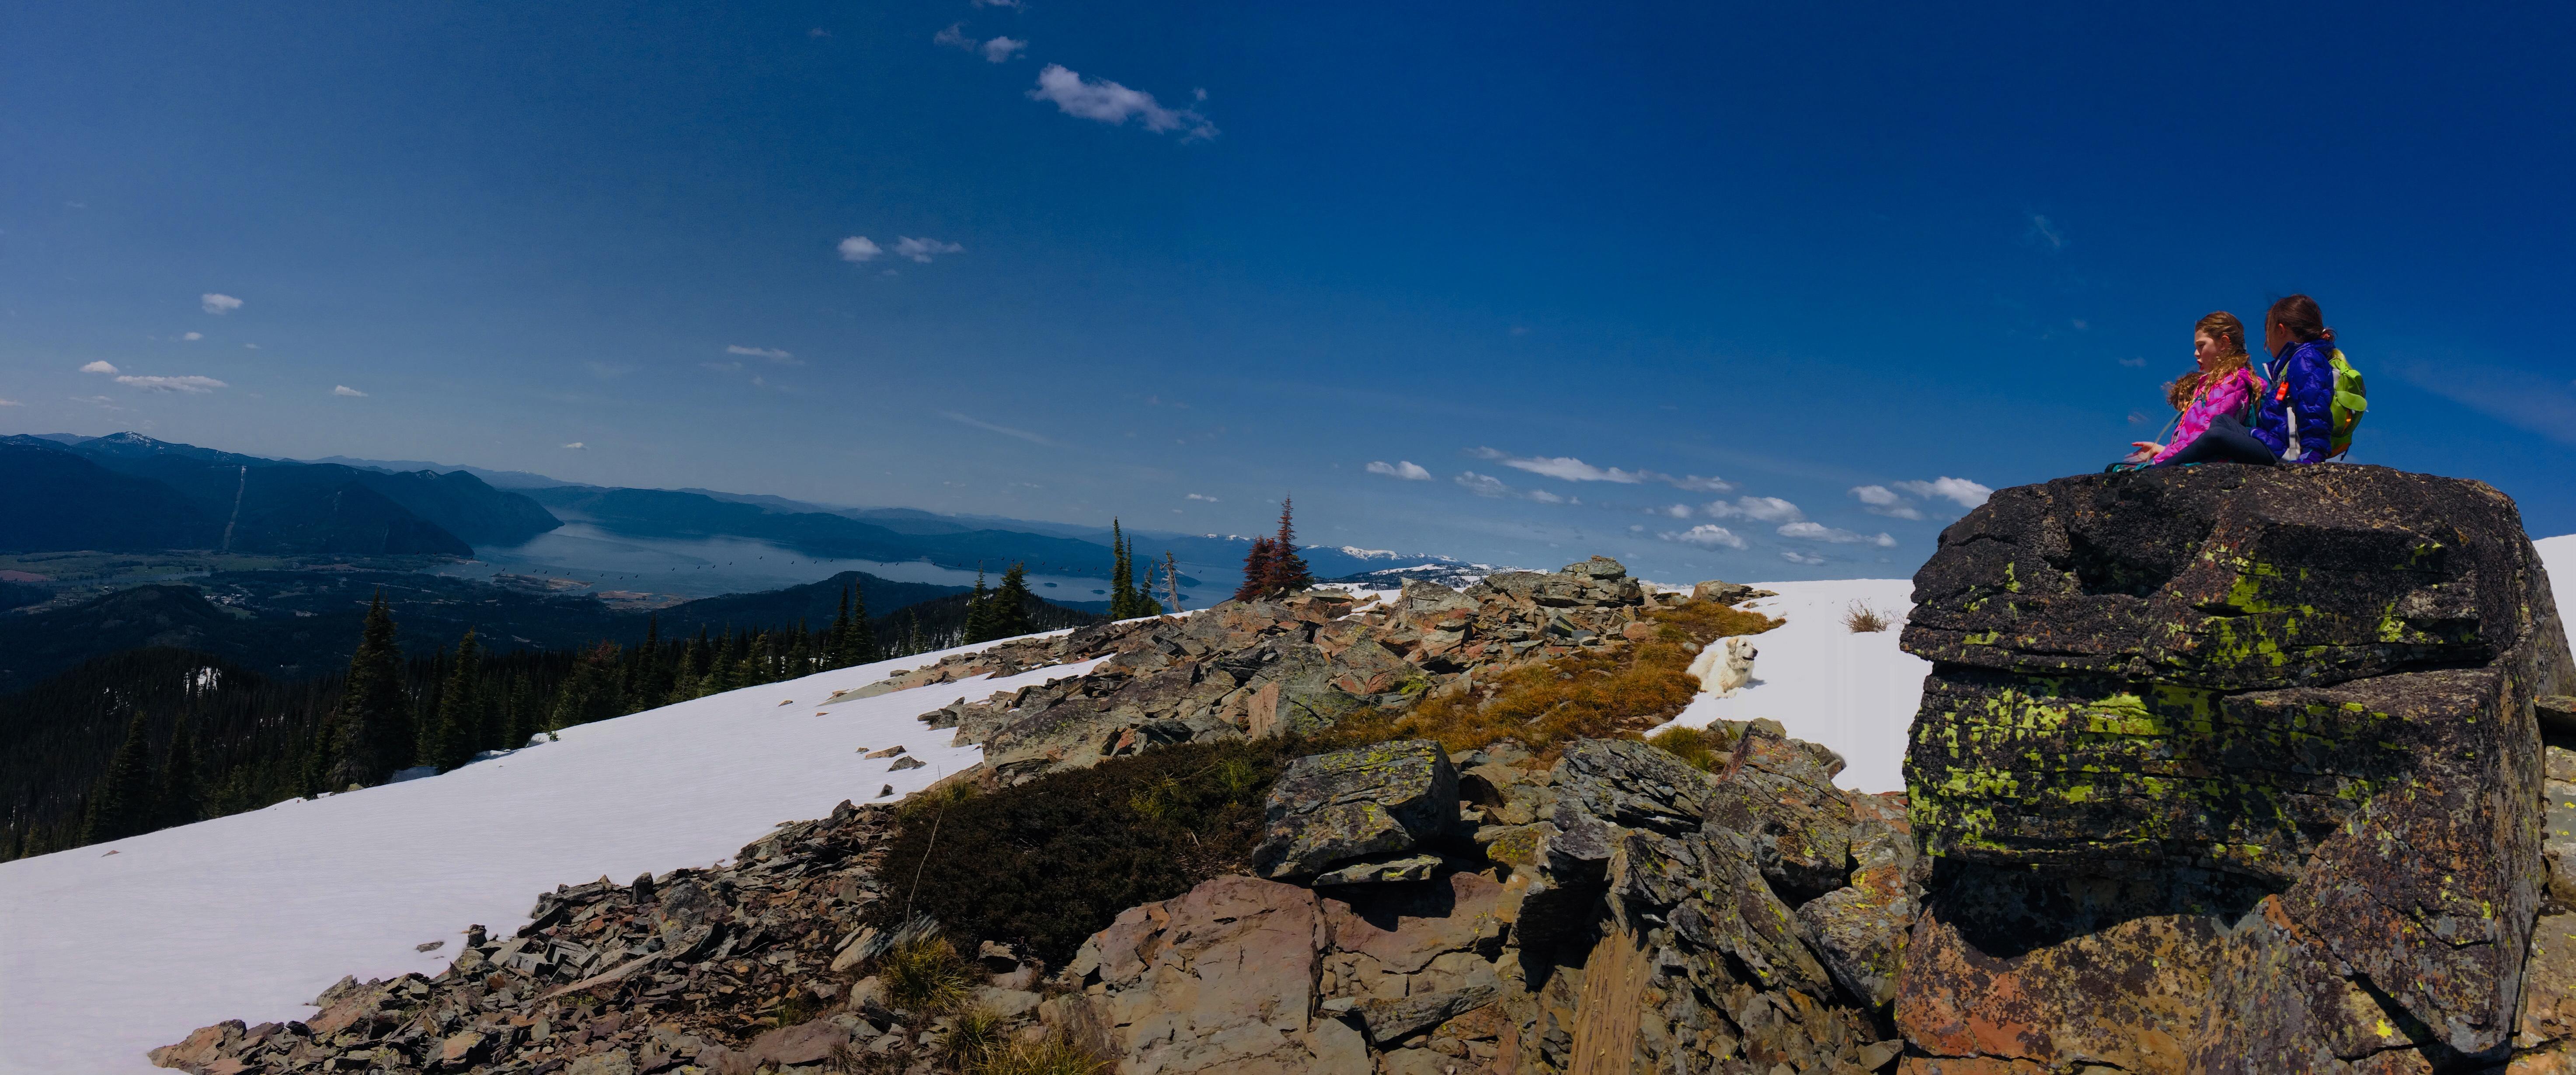 Scotchman Peaks offers summer adventures aplenty